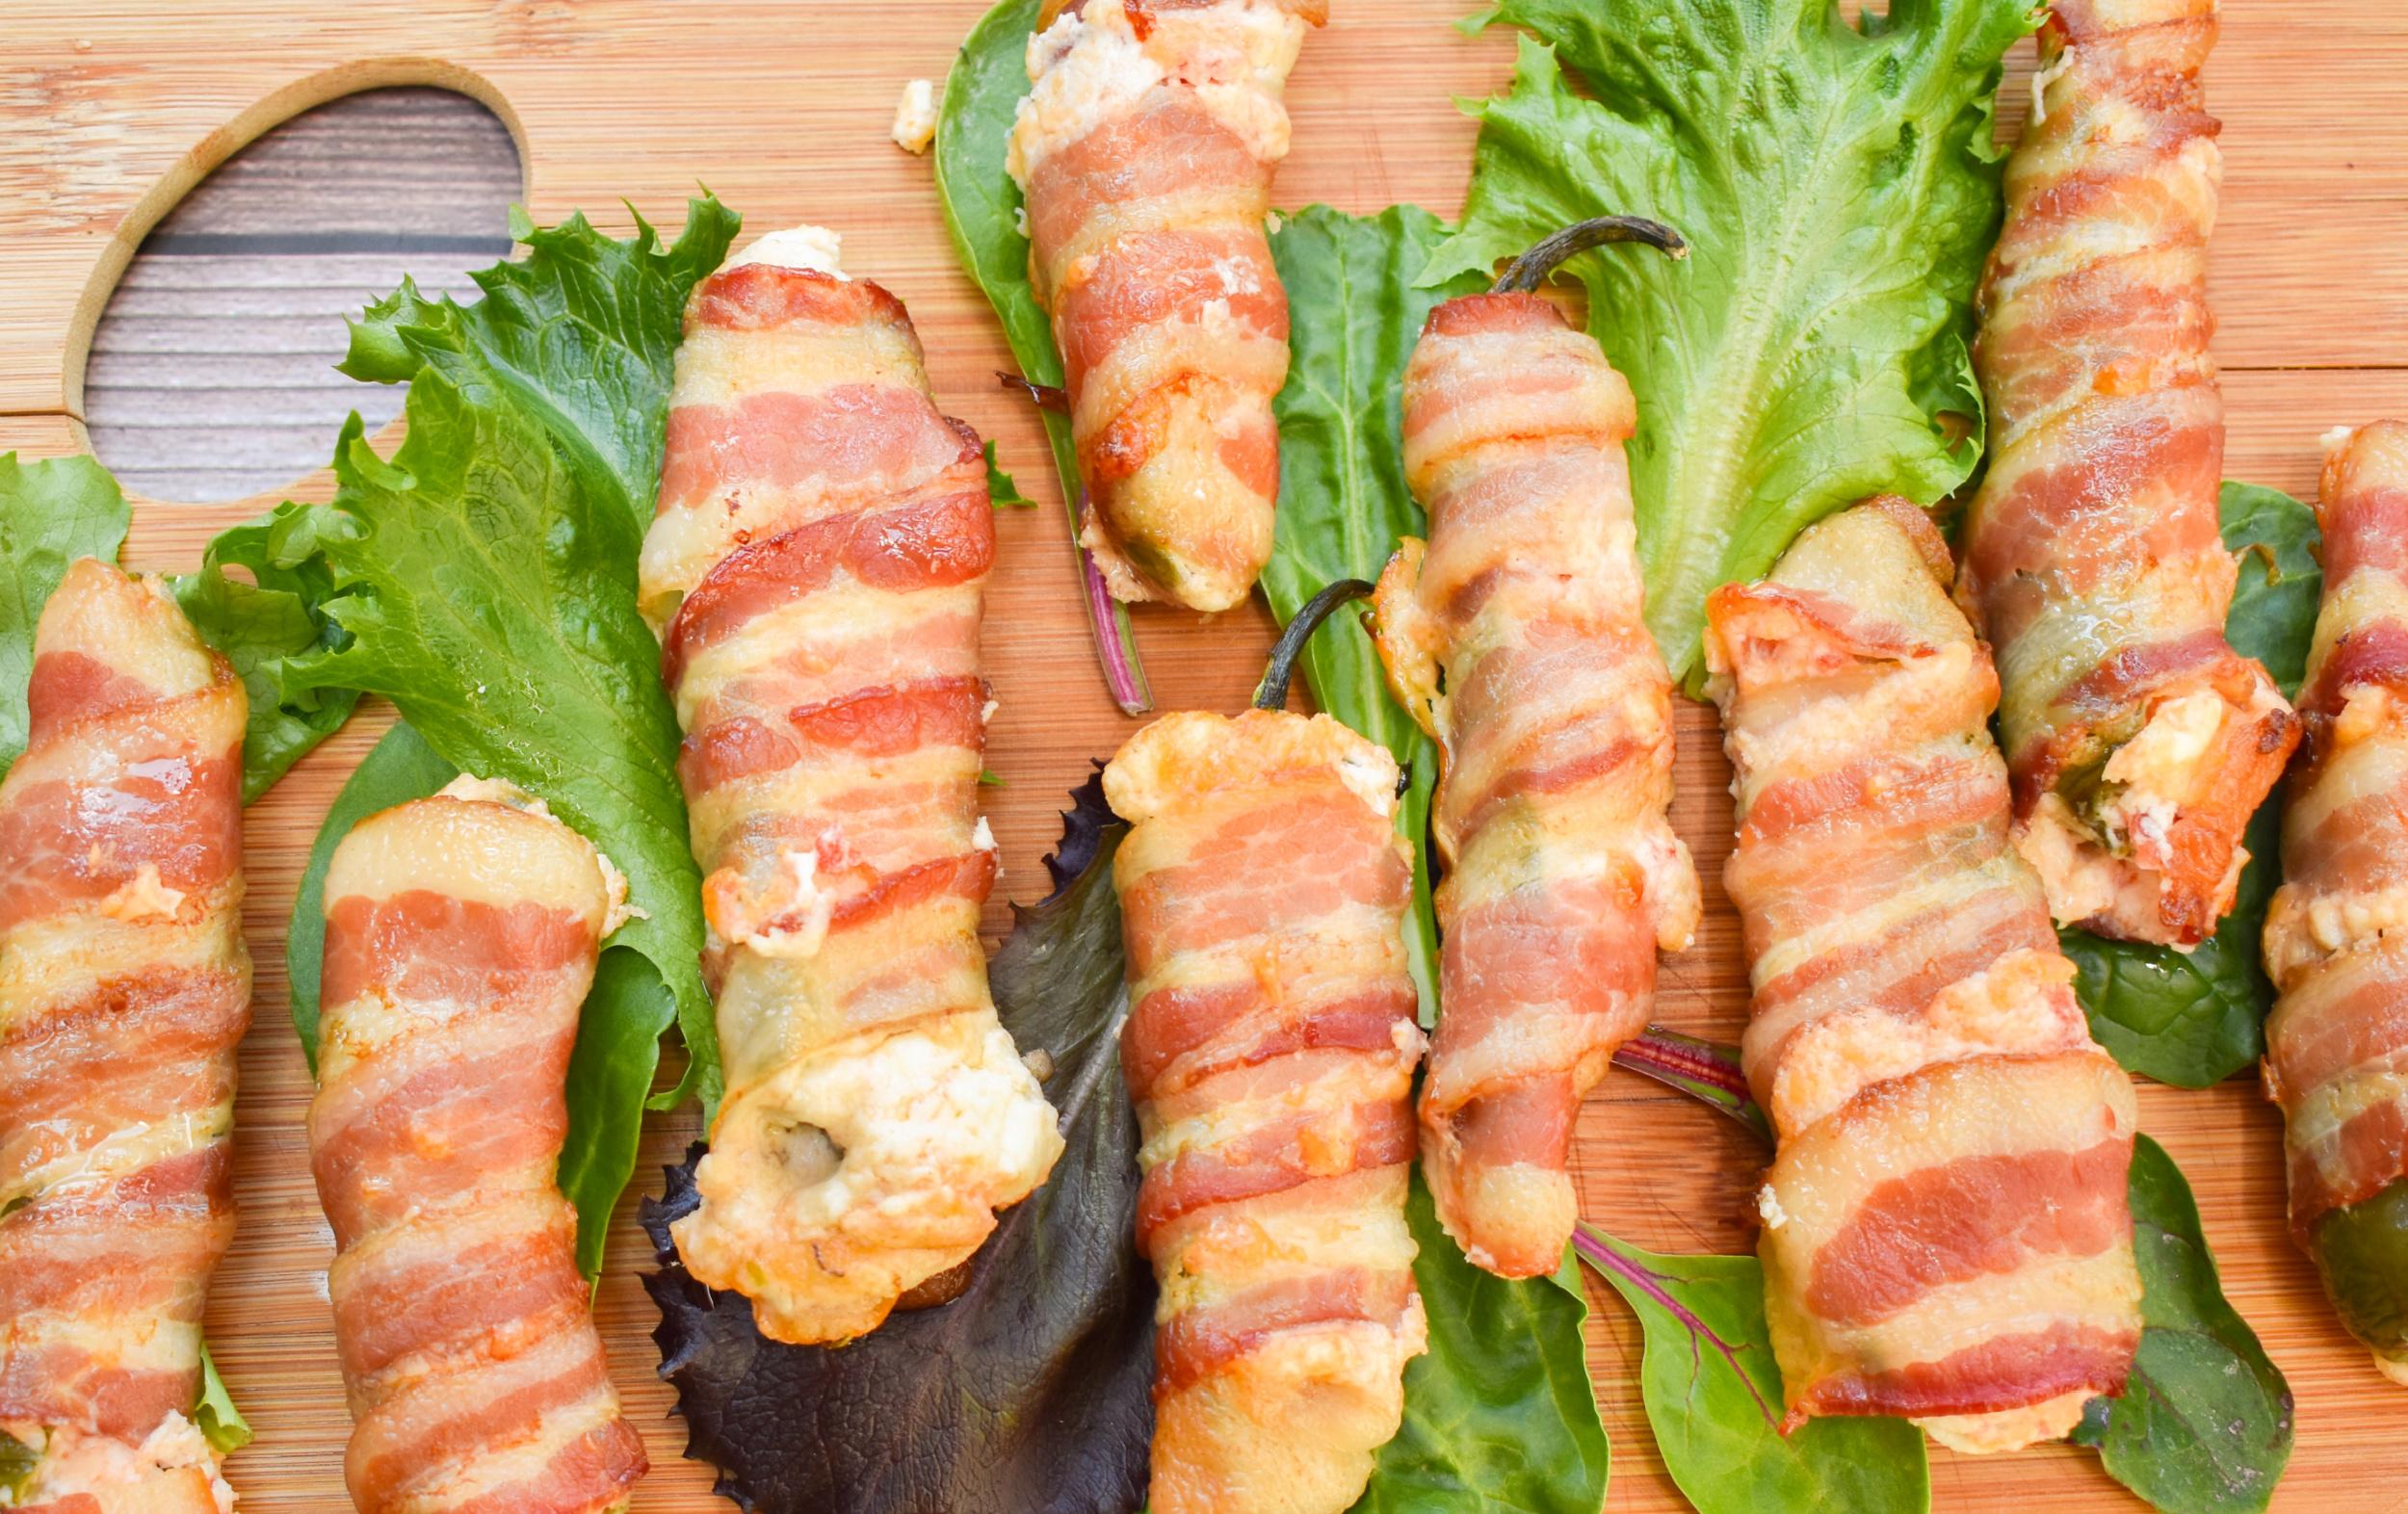 keto bacon jalapeño poppers on a wood board